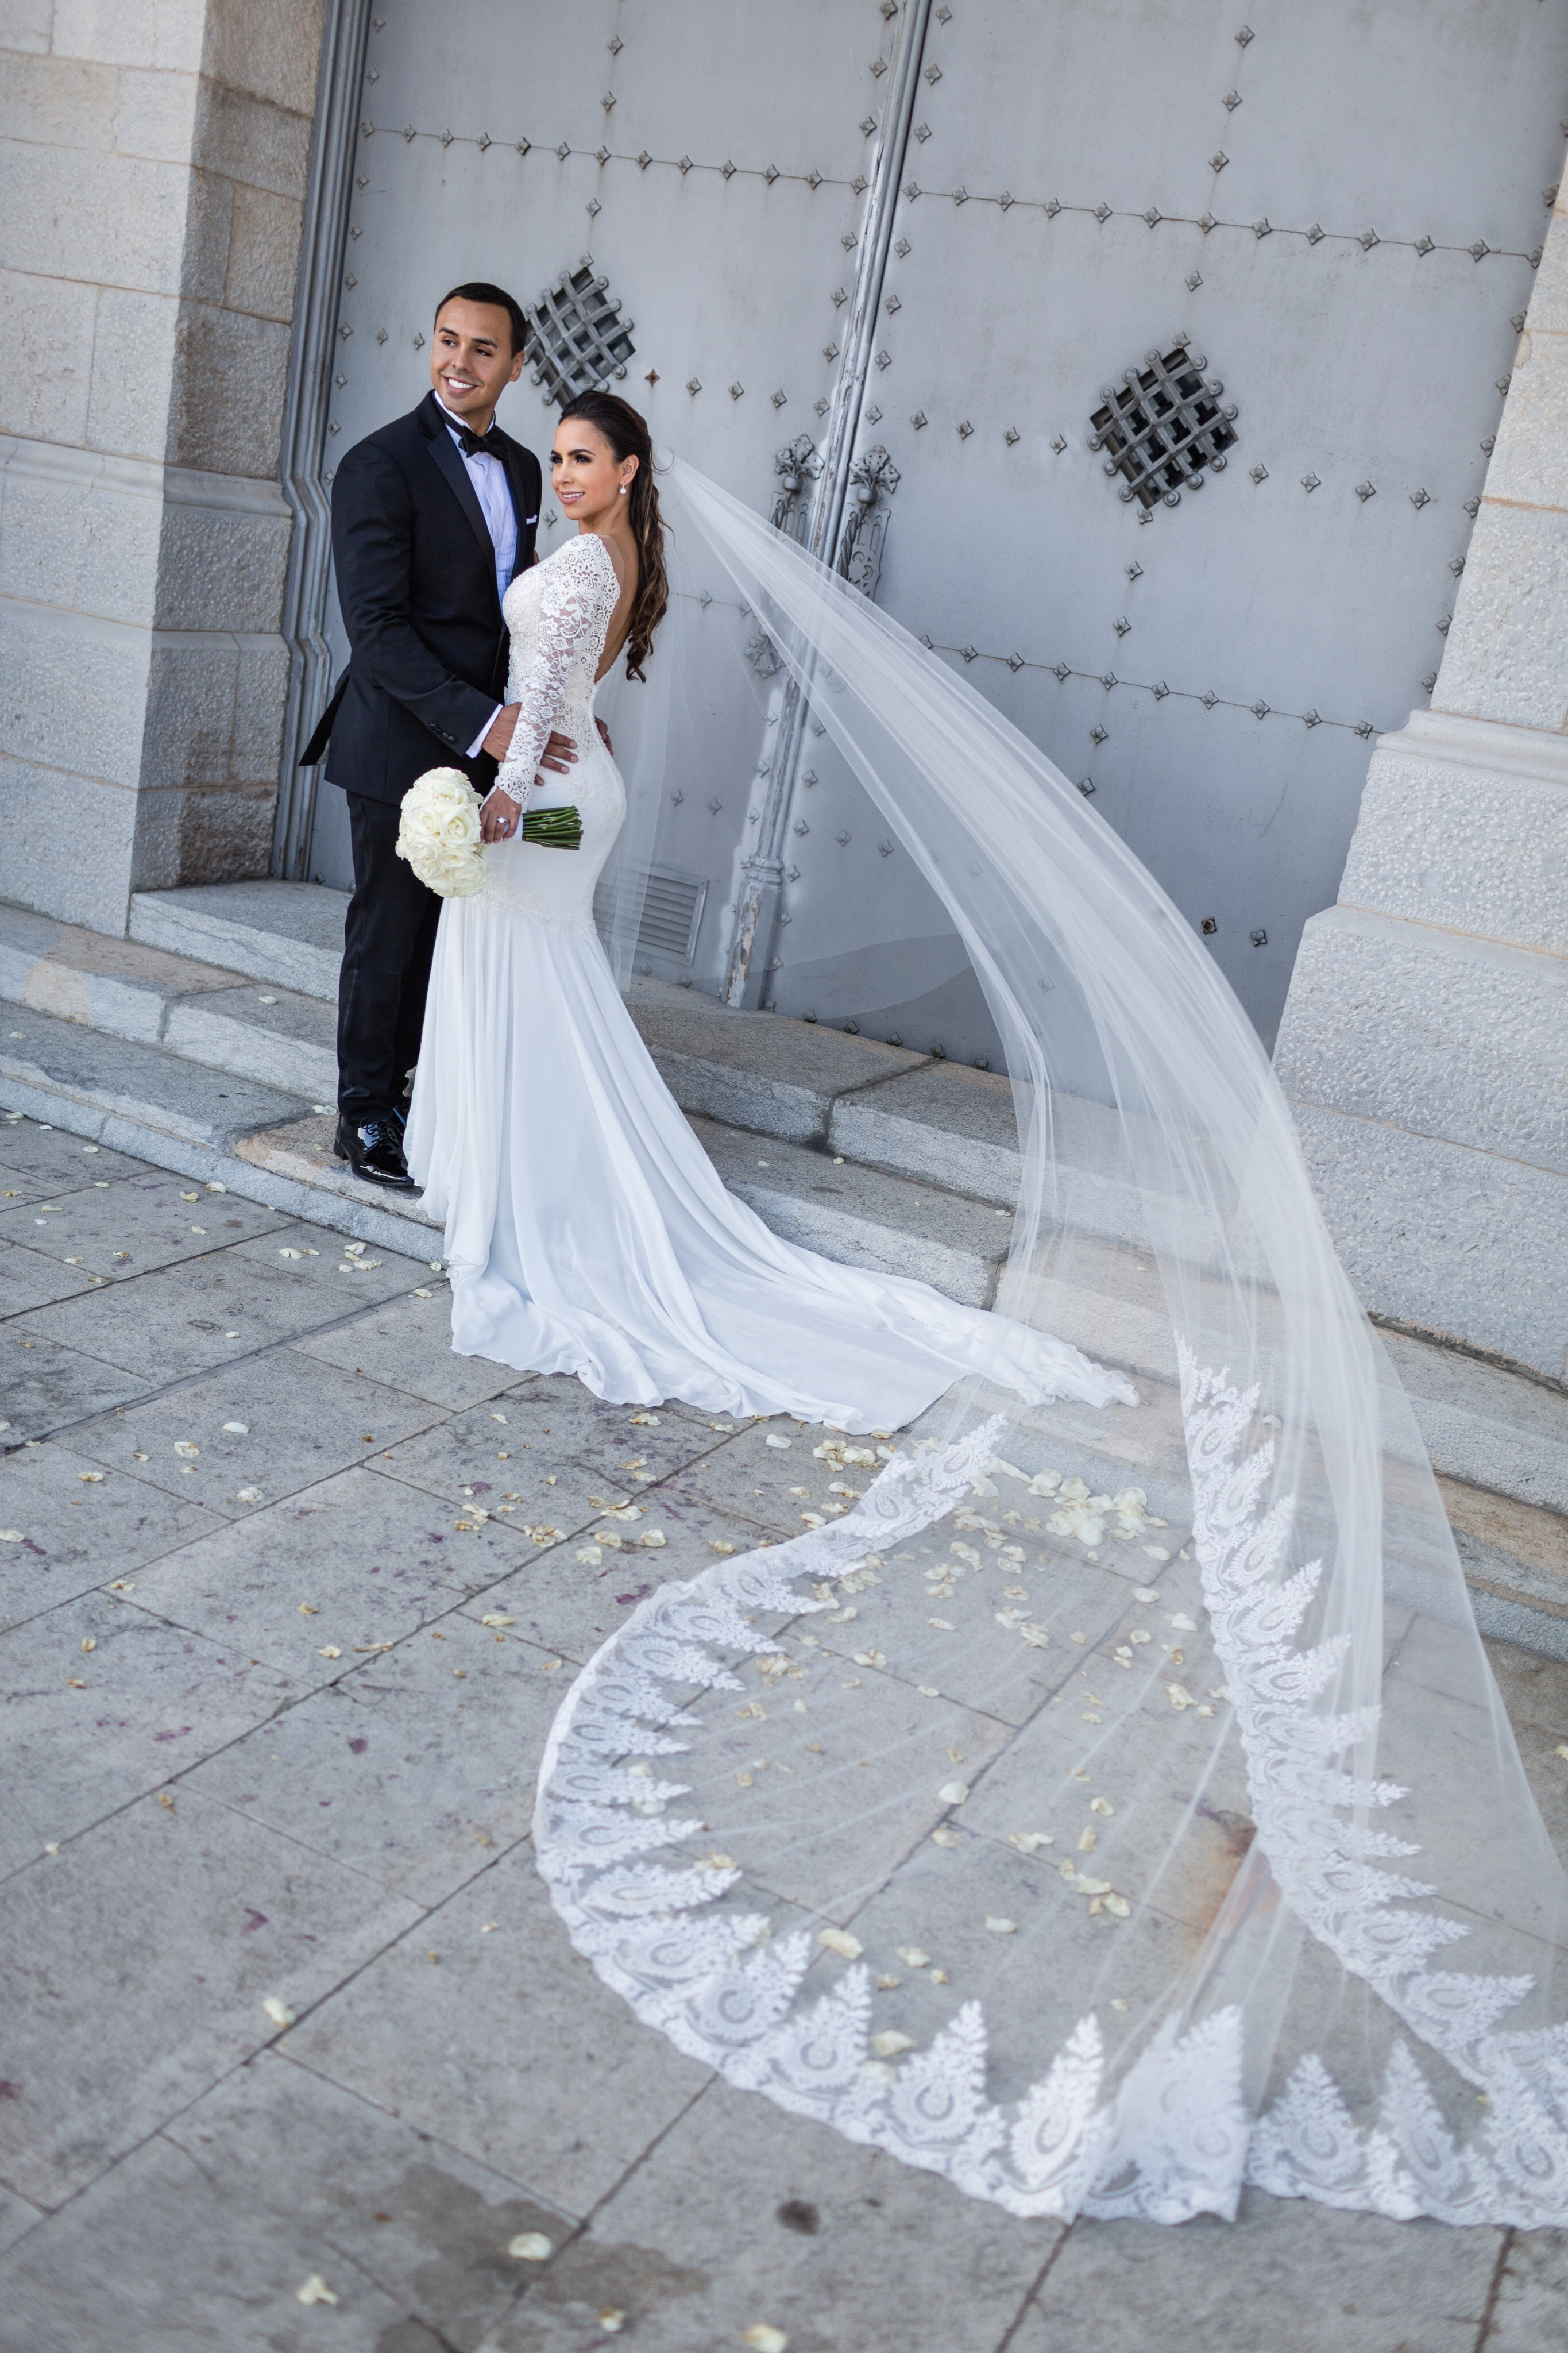 Lisa Morales Shares Her Barcelona Wedding Album Exclusive